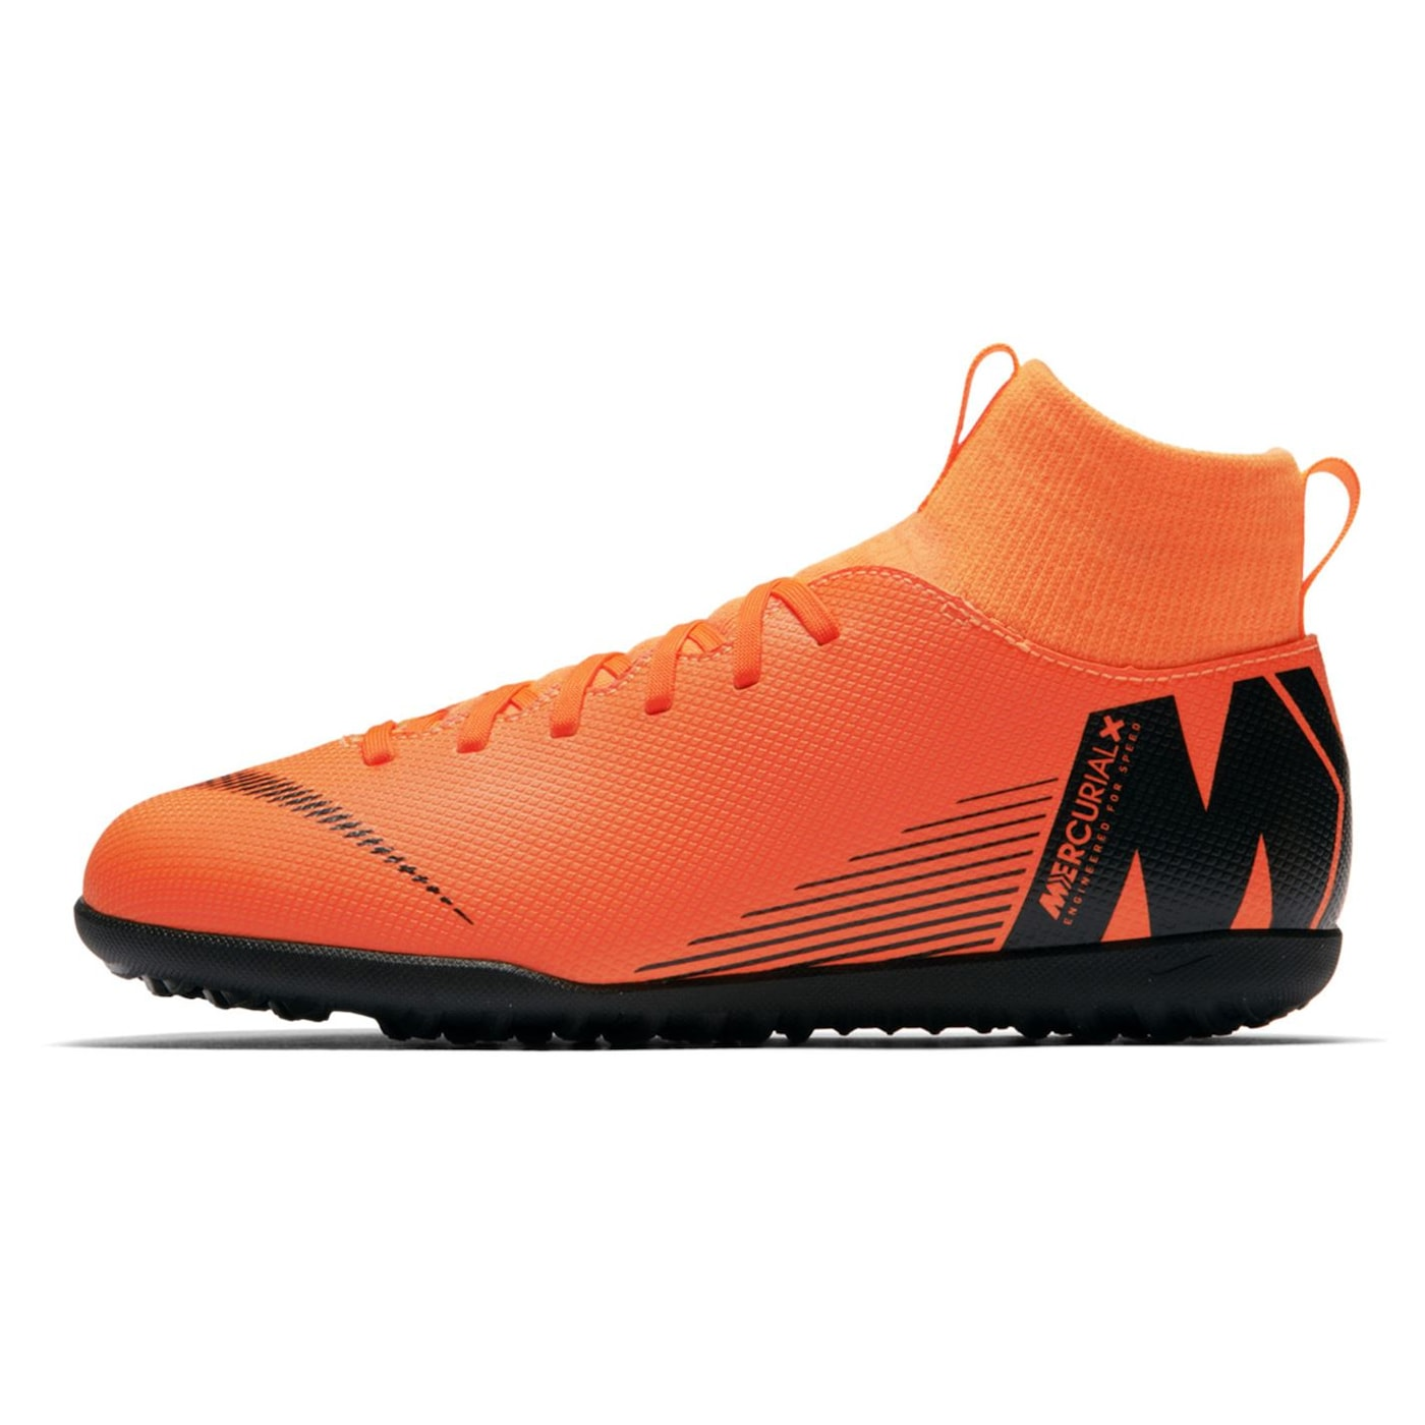 Nike Mercurial Superfly Club Junior Astro Turf Trainers